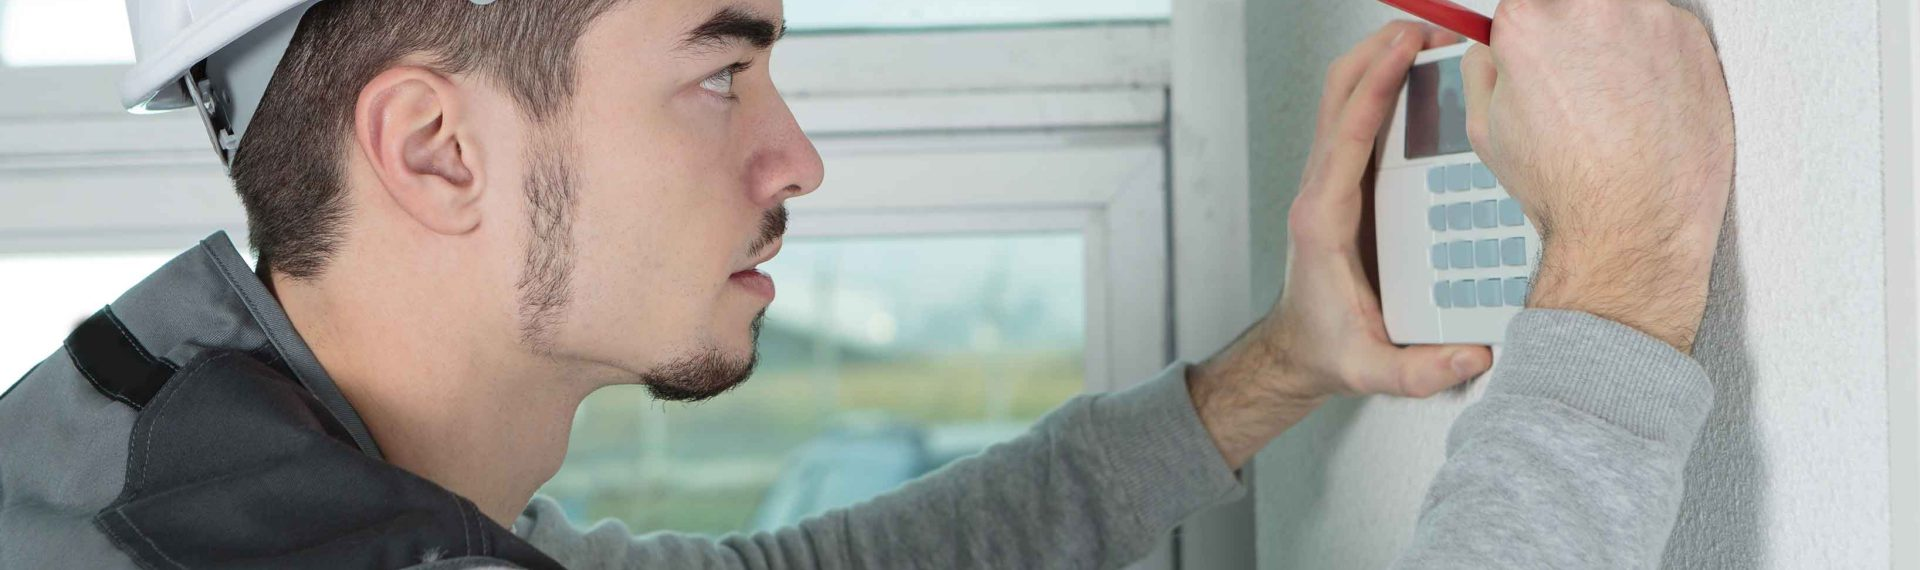 Security & Alarm Company Public Liability Insurance: Explained